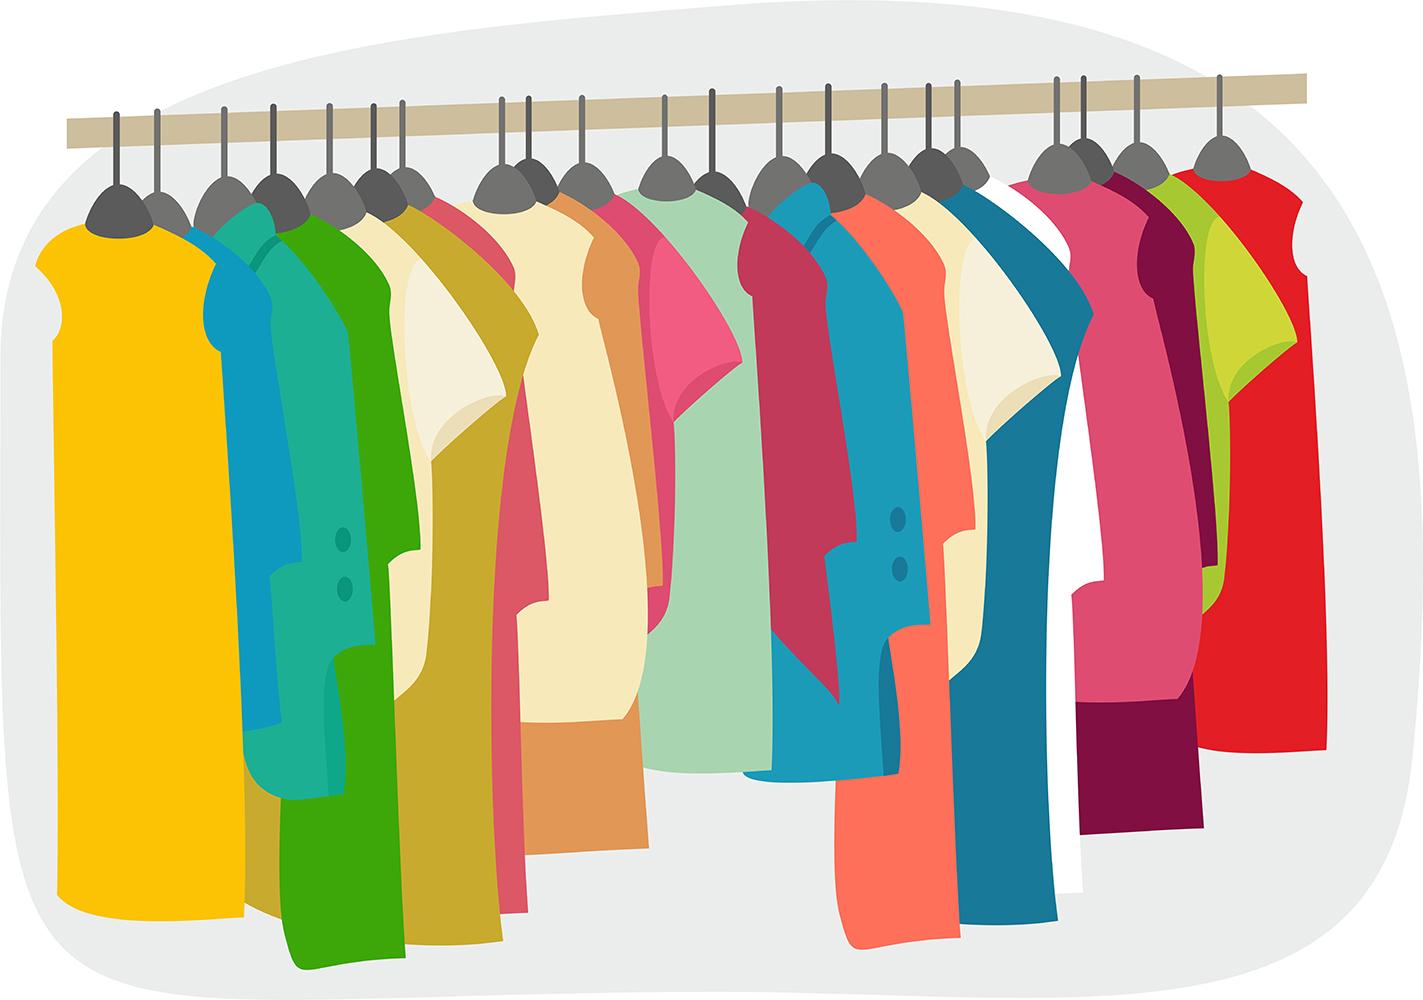 Clothes Clipart-clothes clipart-9